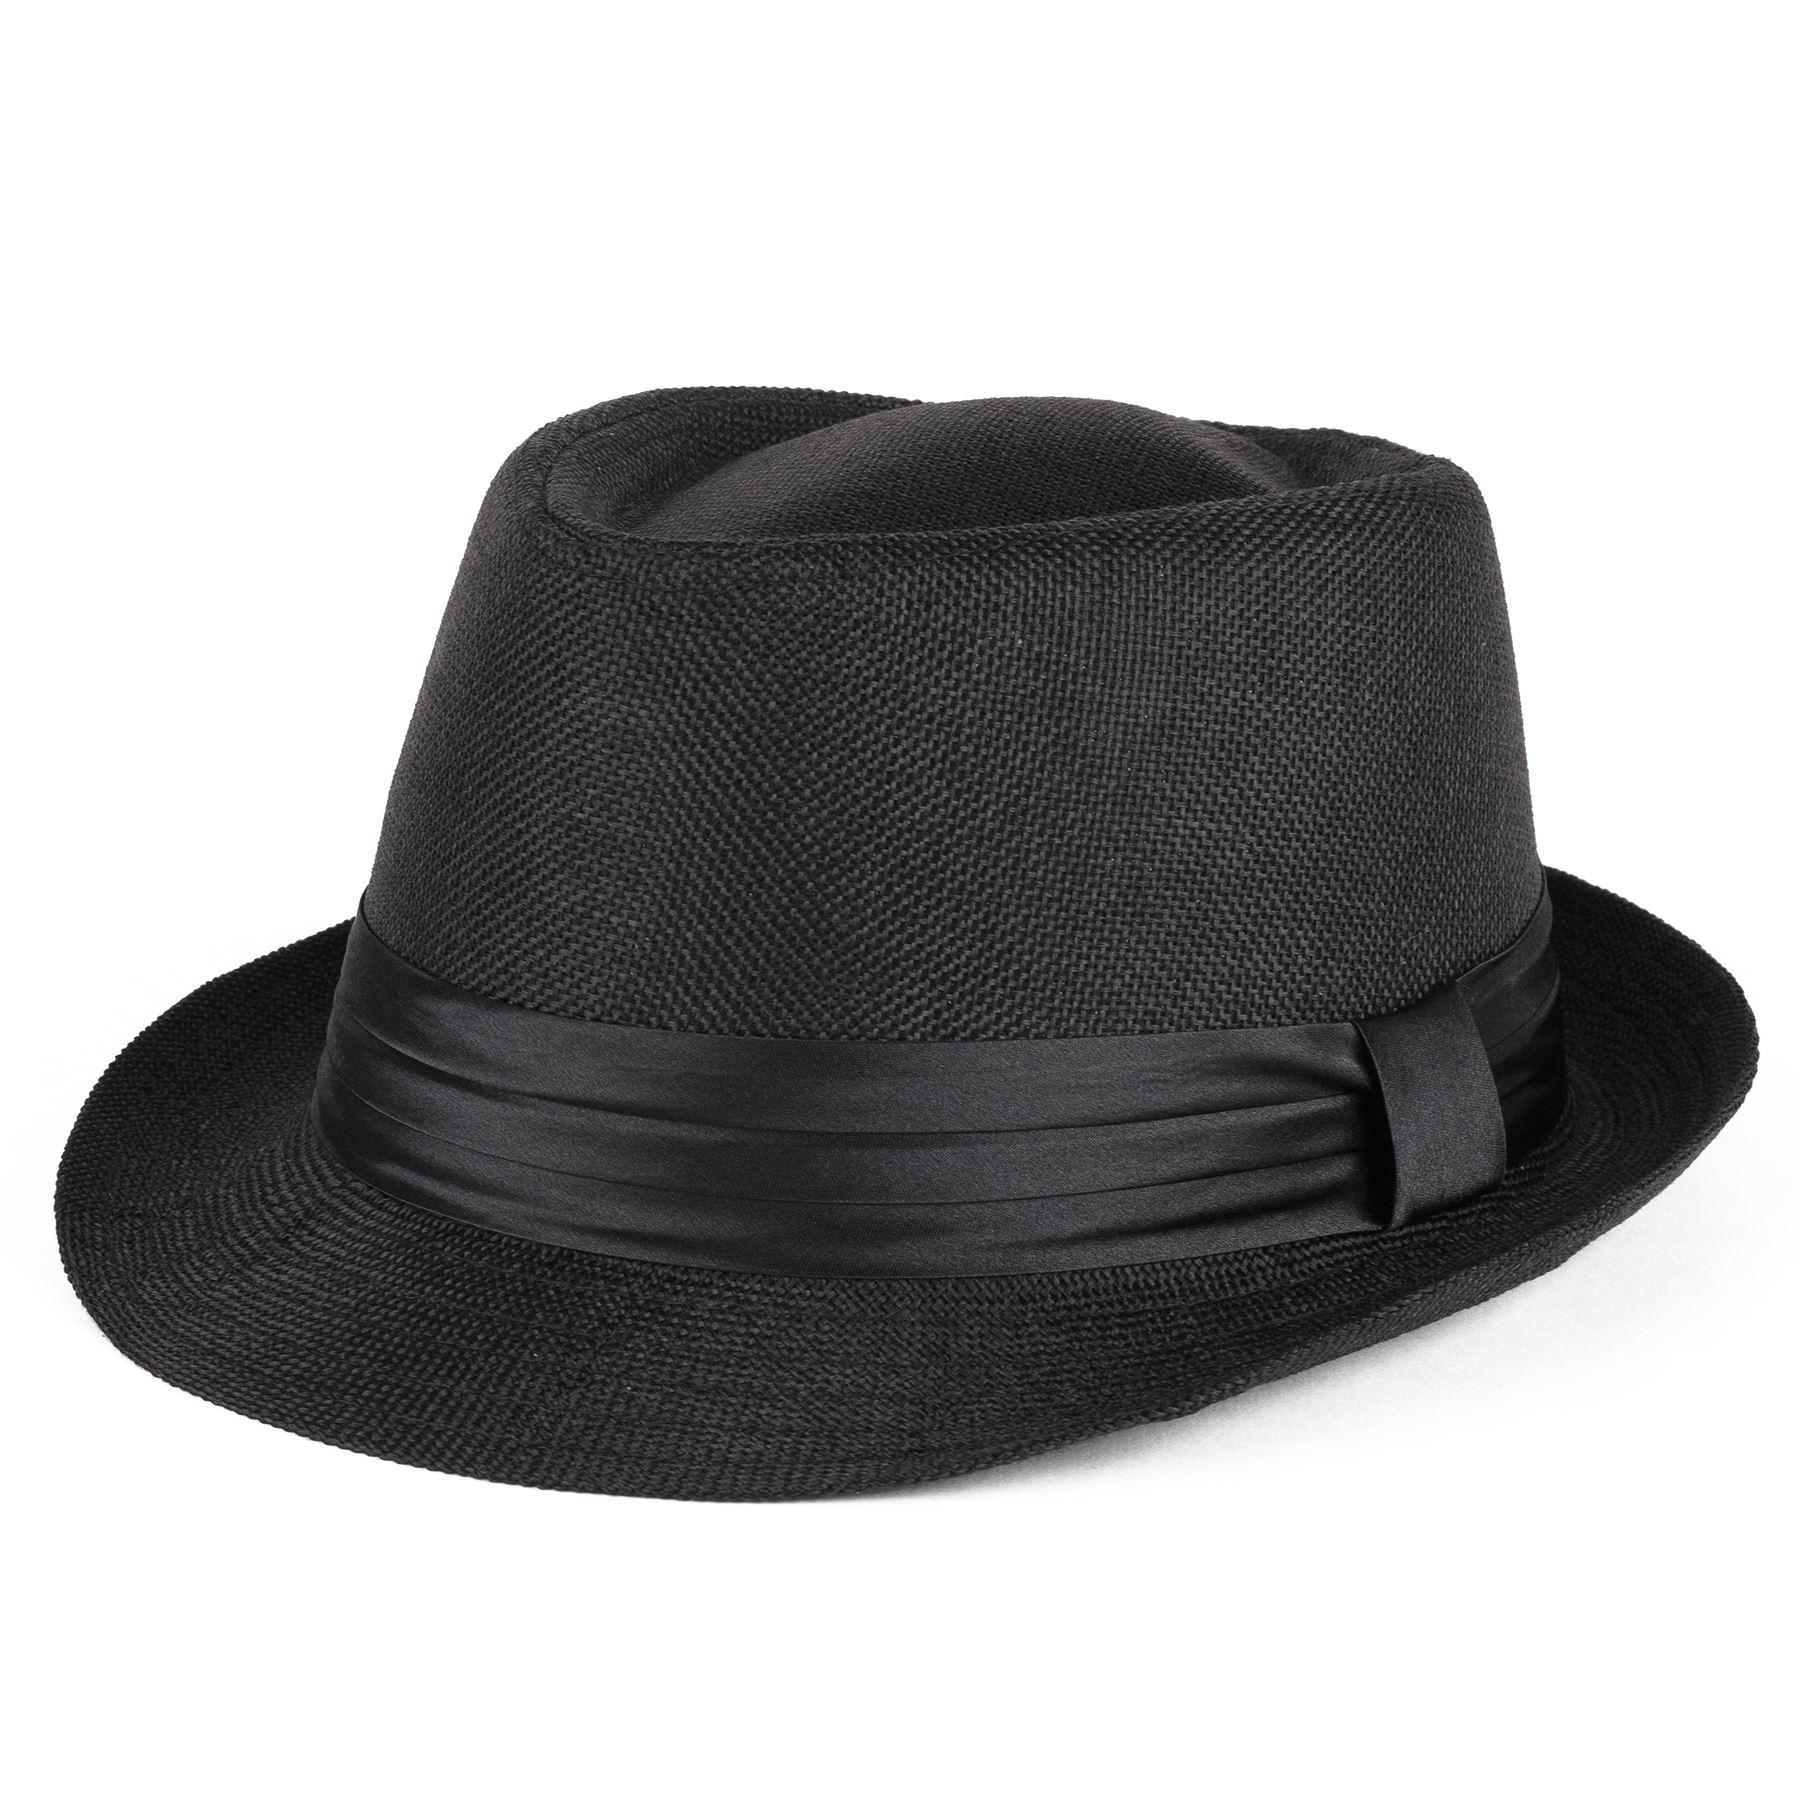 trilby hat with satin black band ebay